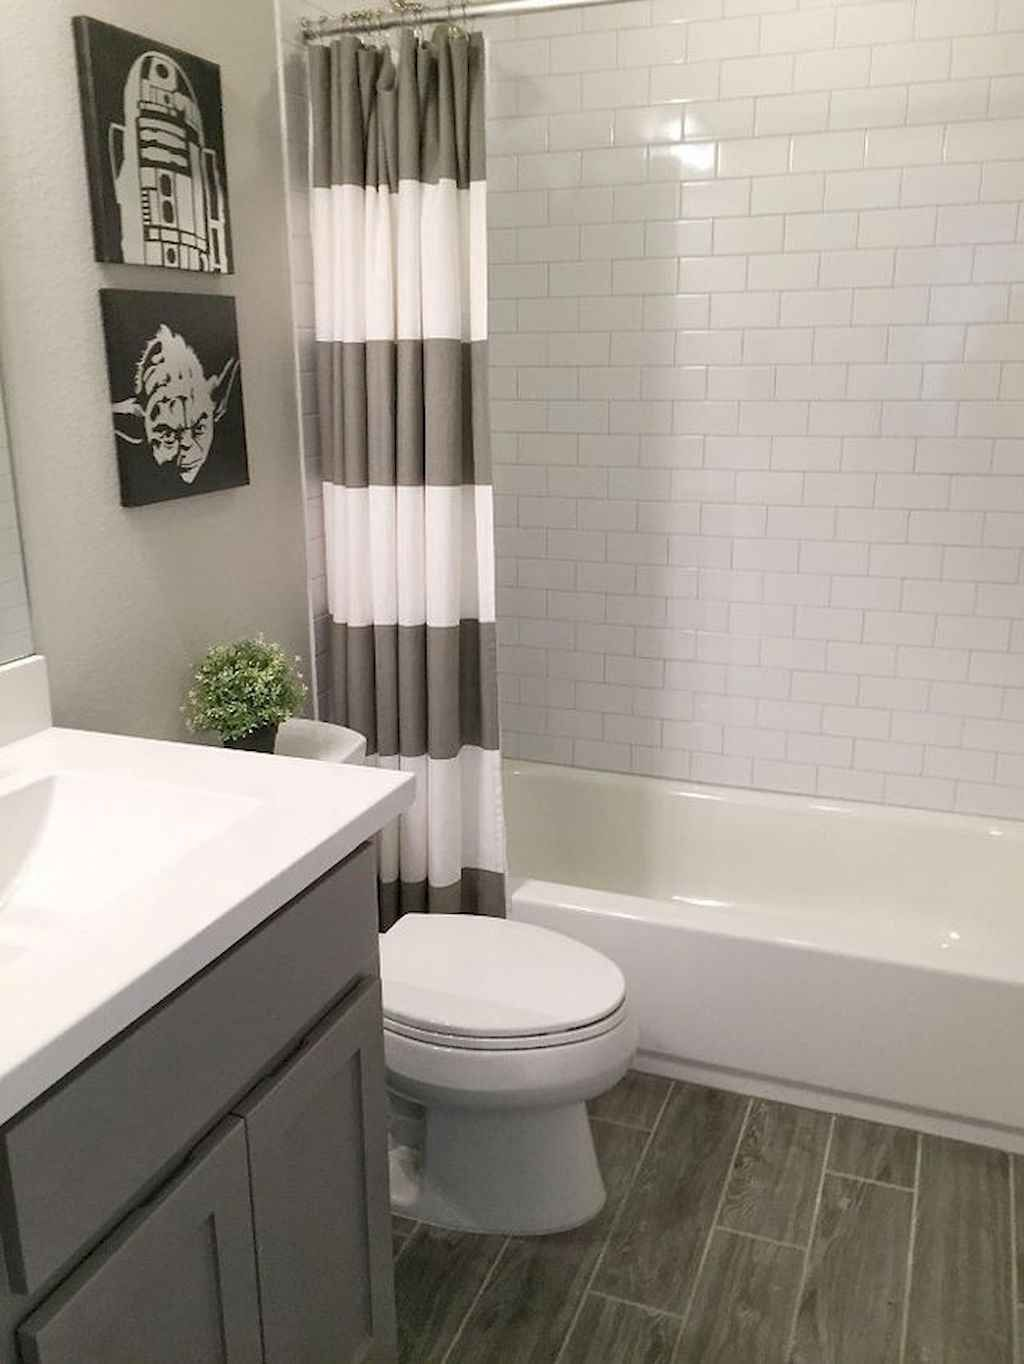 60 Guest Bathroom Makeover Design Ideas Gladecor Com In 2020 Gray Bathroom Decor Diy Bathroom Makeover Small Bathroom Remodel